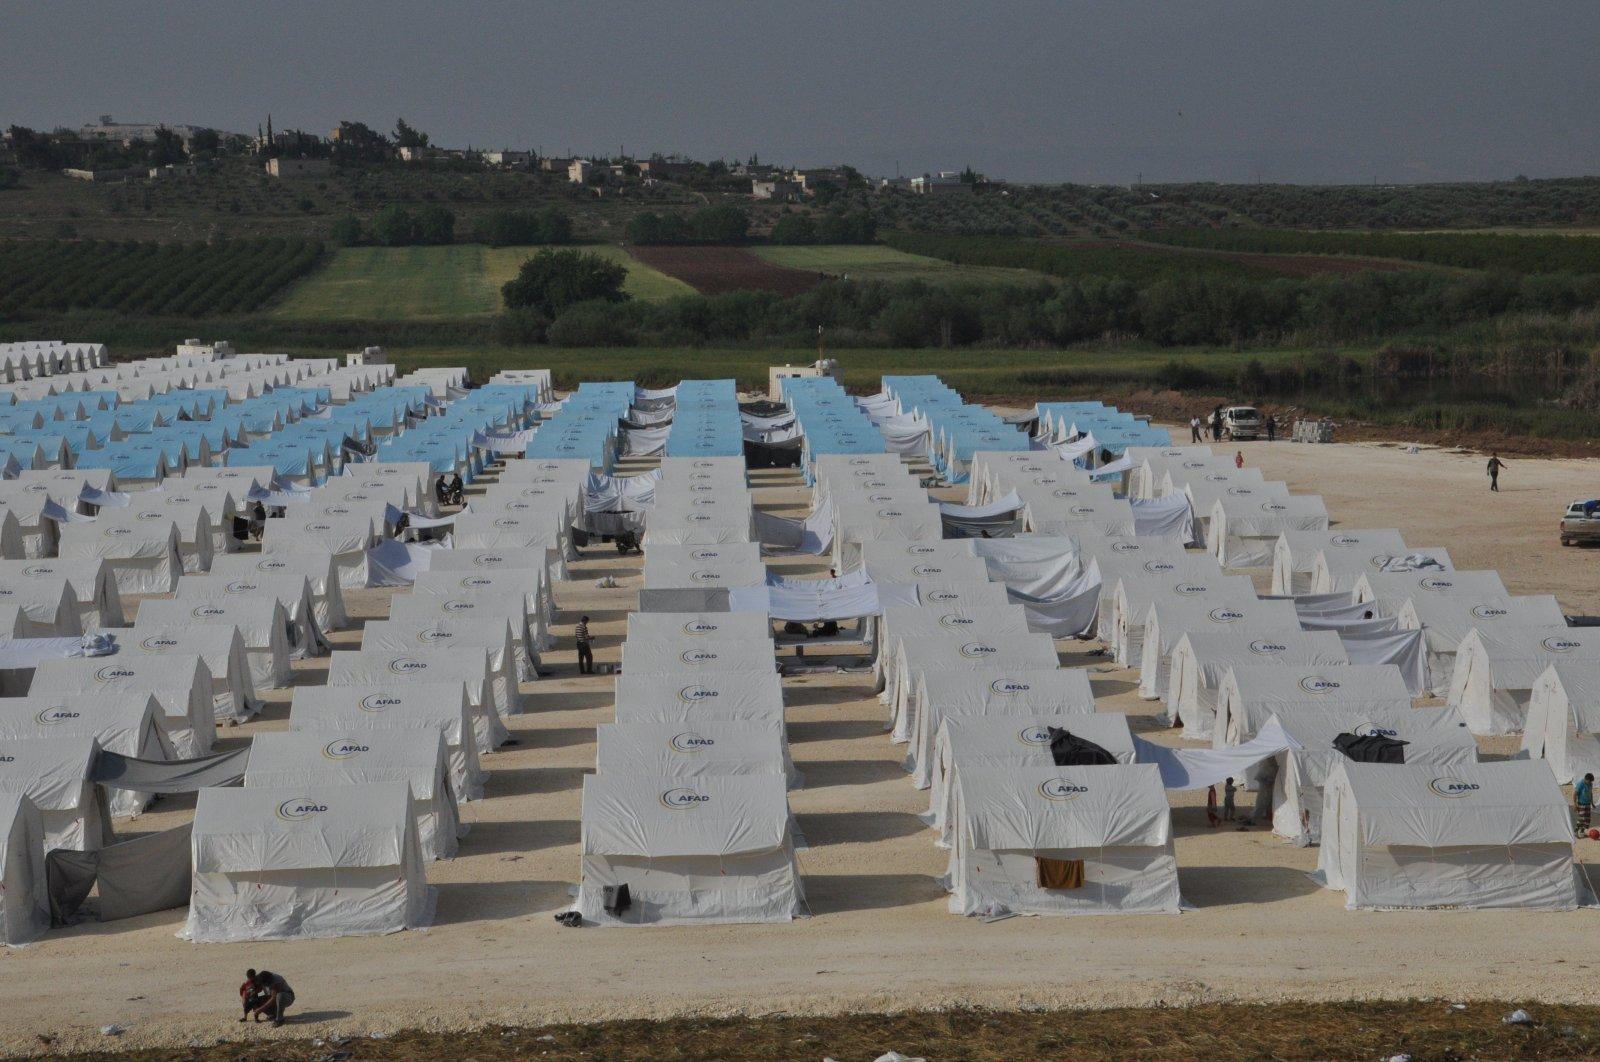 AFAD refugee camp in Syria's Afrin province (IHA File Photo)